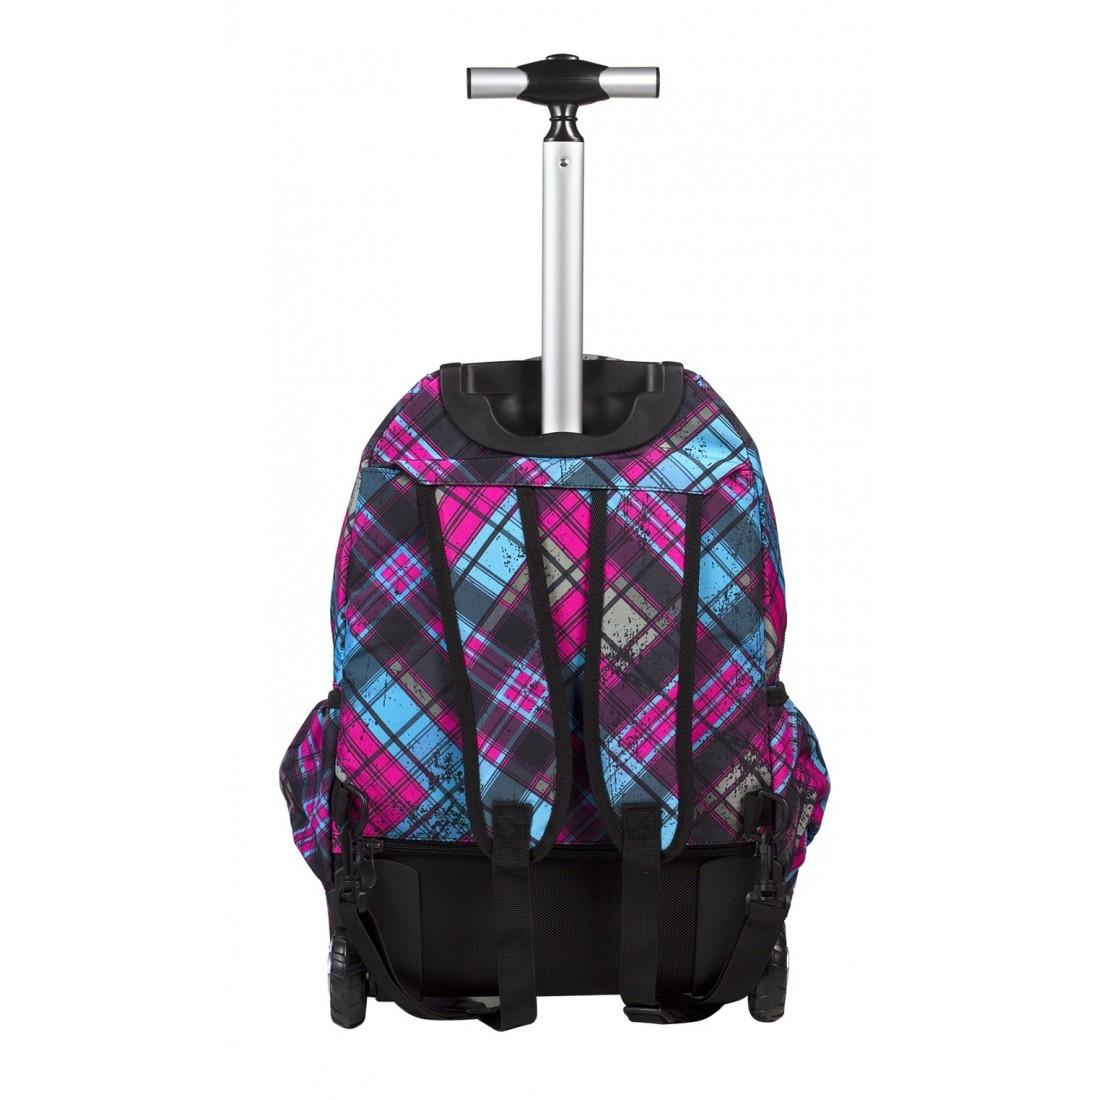 Plecak na kółkach CoolPack Junior STRATFORD CP 043a Różowo Niebieski - plecak-tornister.pl